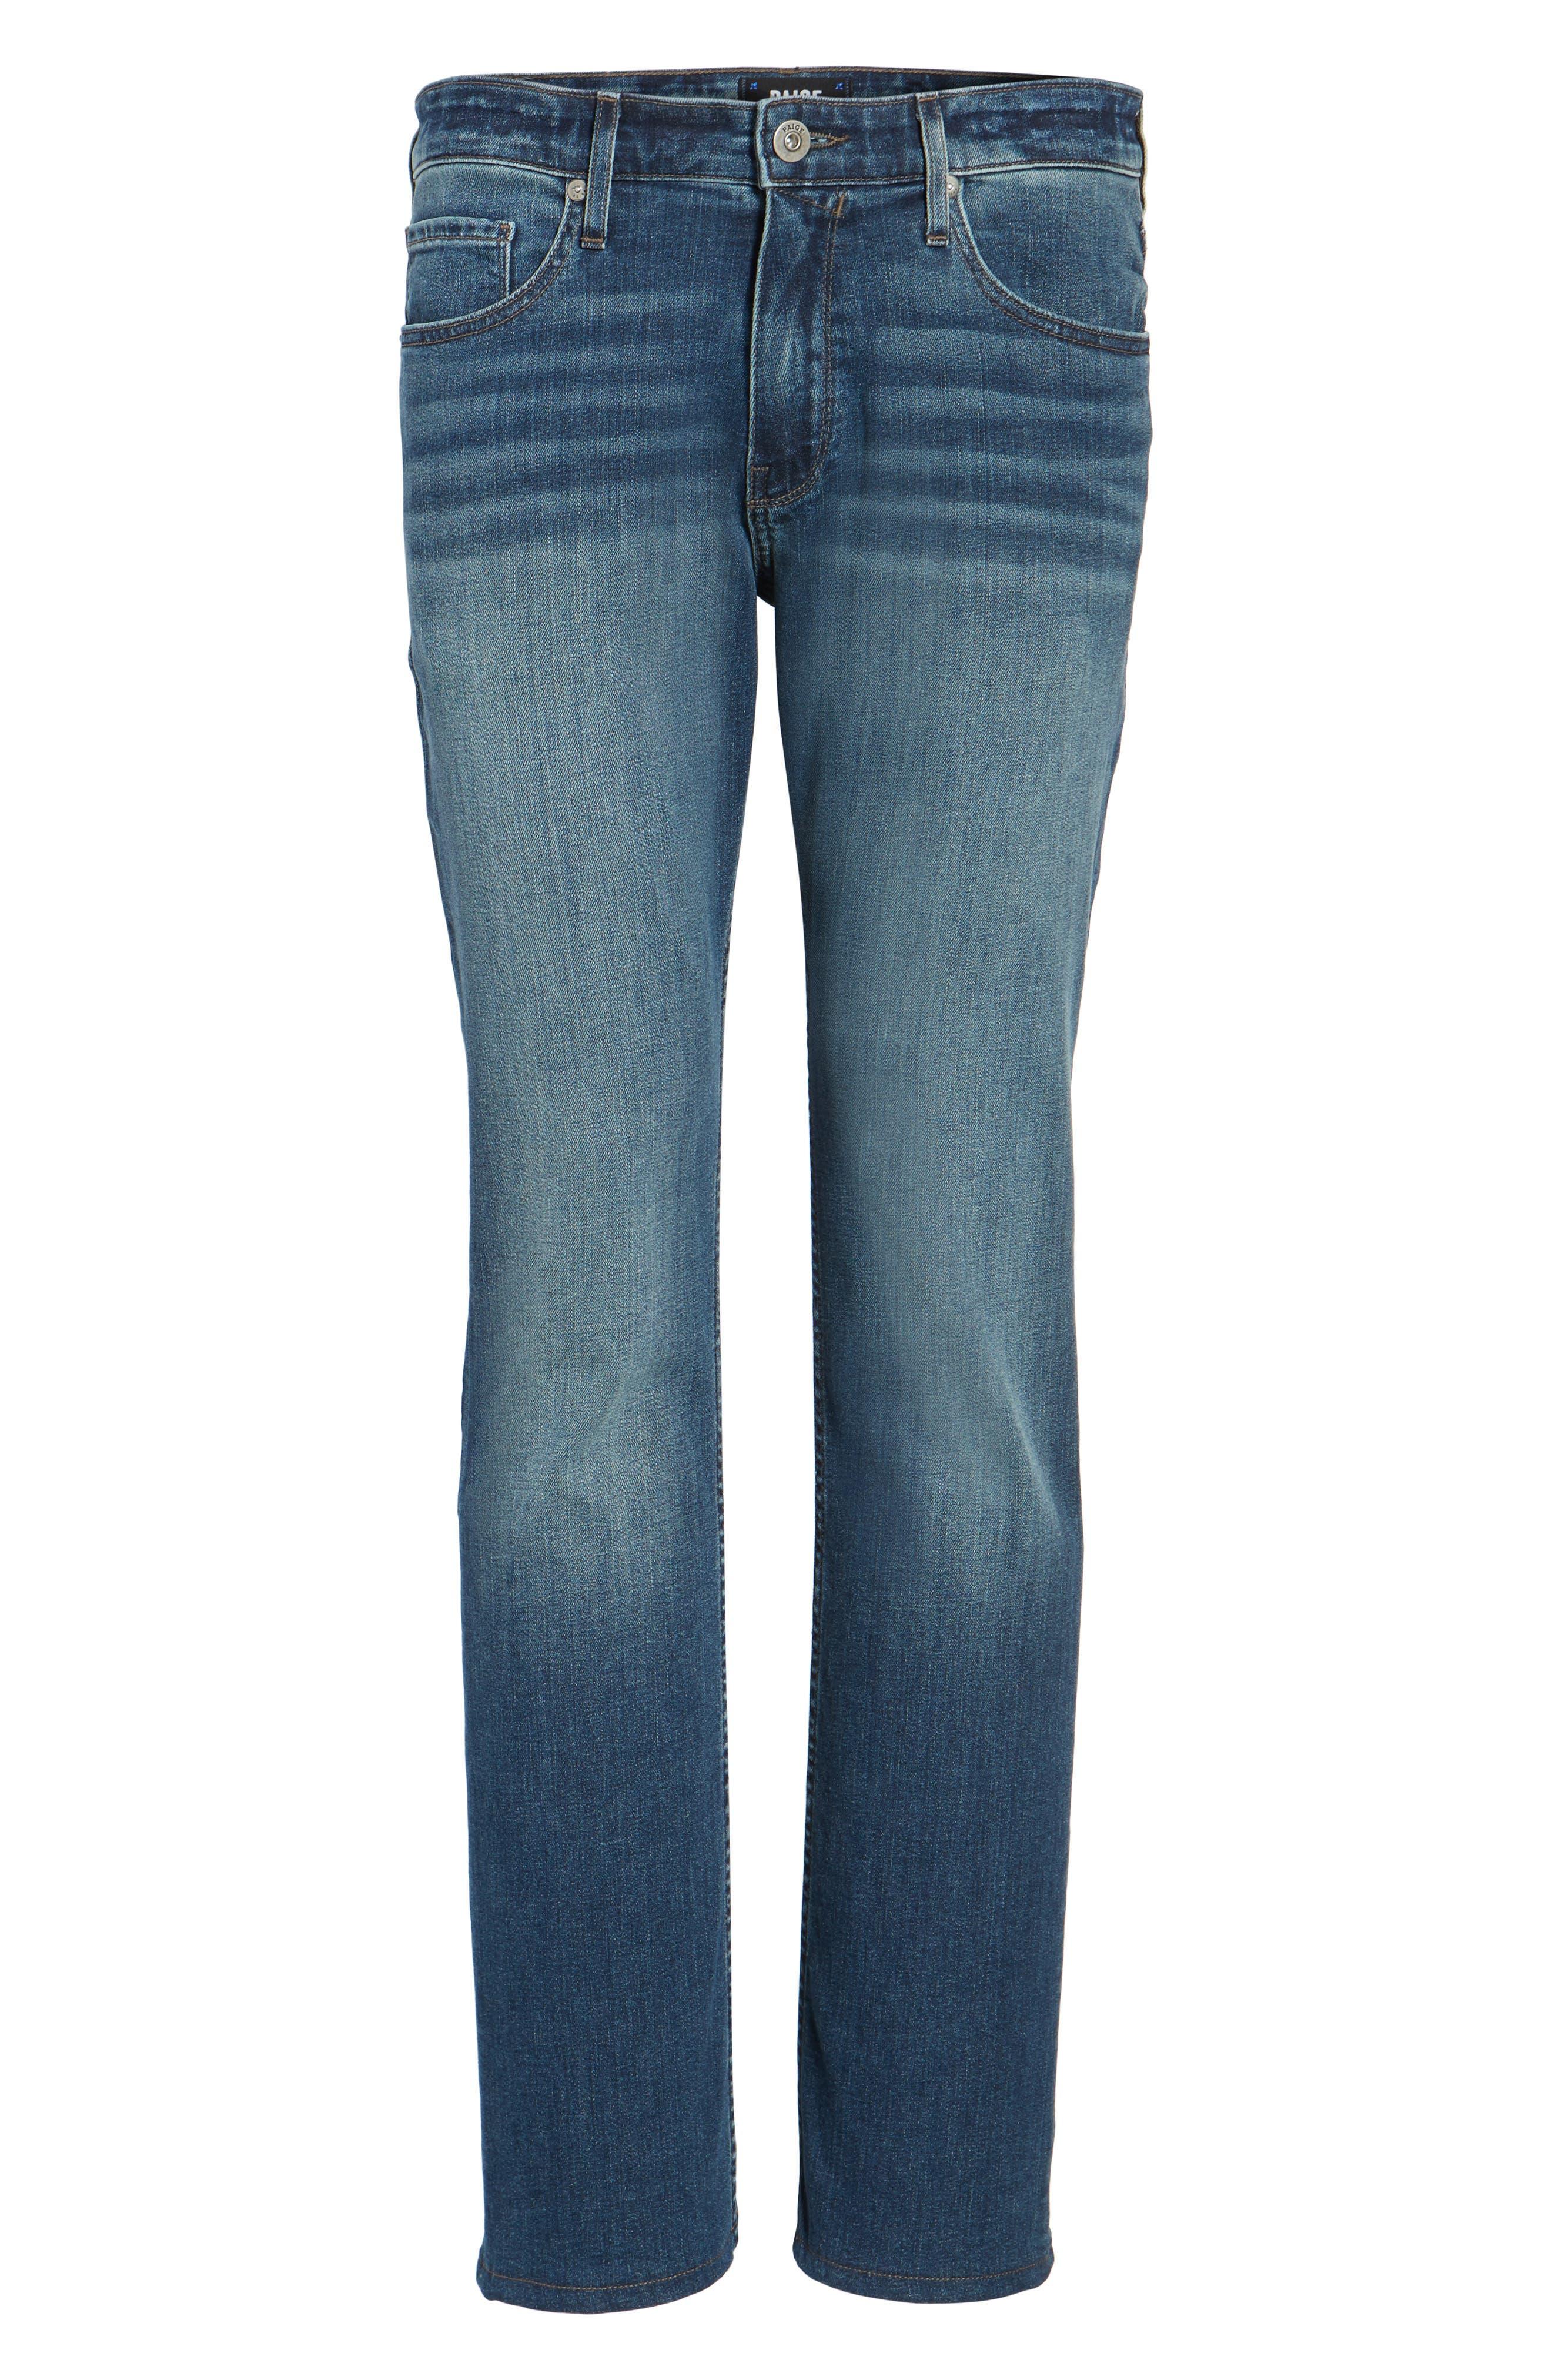 Legacy - Normandie Straight Leg Jeans,                             Alternate thumbnail 6, color,                             Ewan